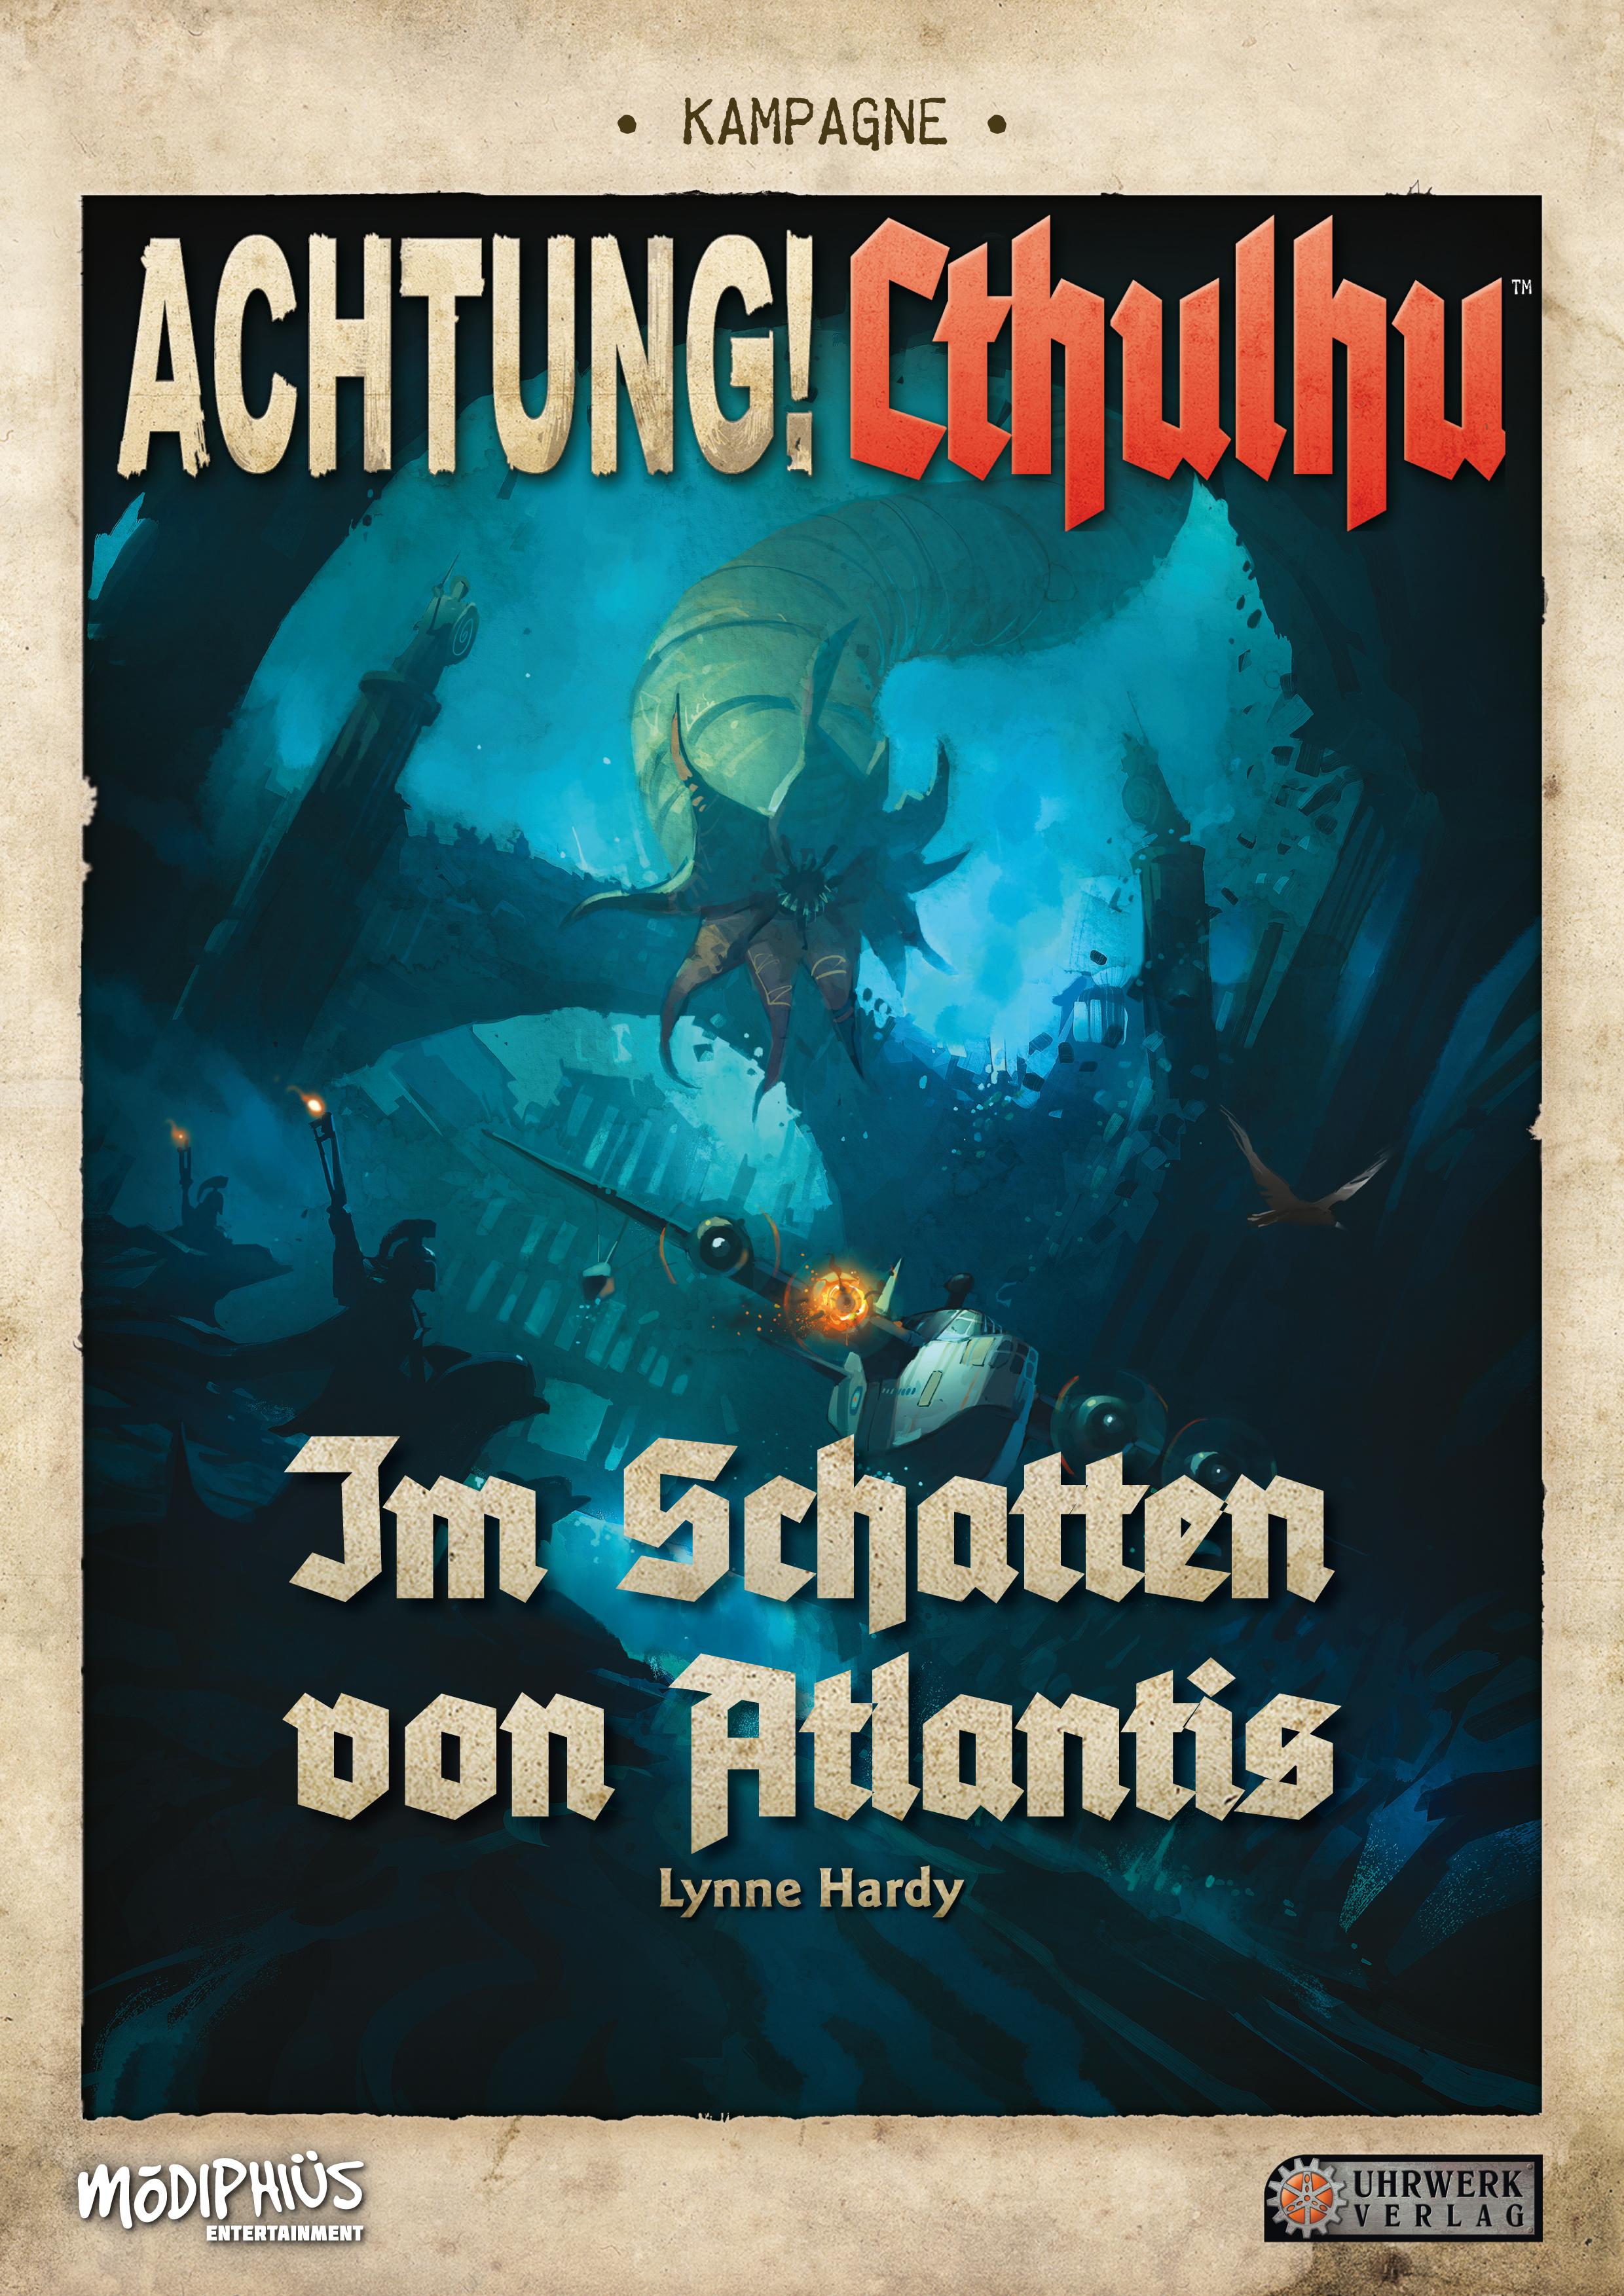 Konige Der Finsternis Karte.Achtung Cthulhu Uhrwerk Verlag